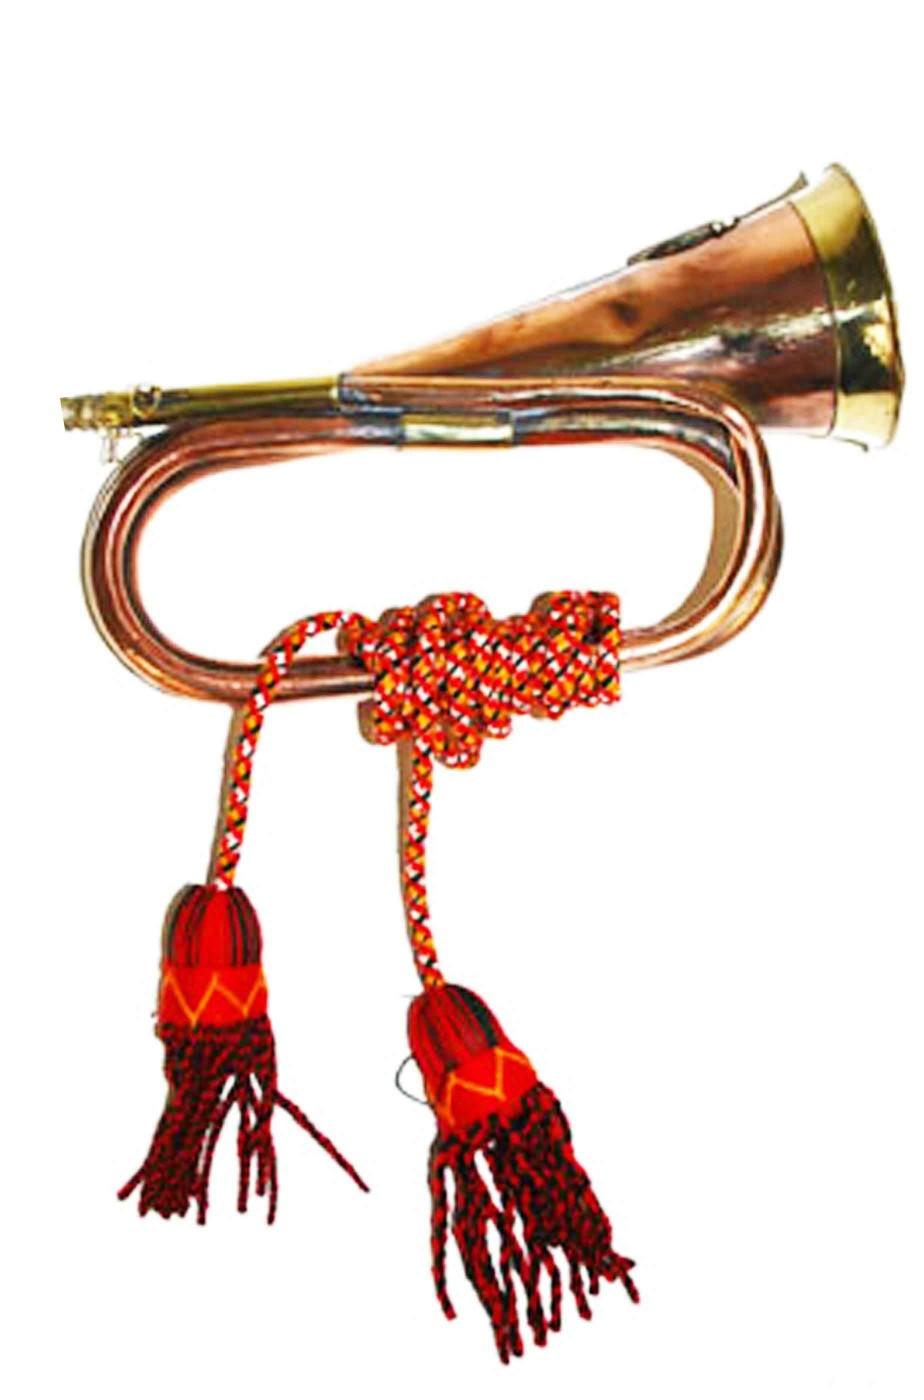 Tromba da cavalleria decorativa in metallo